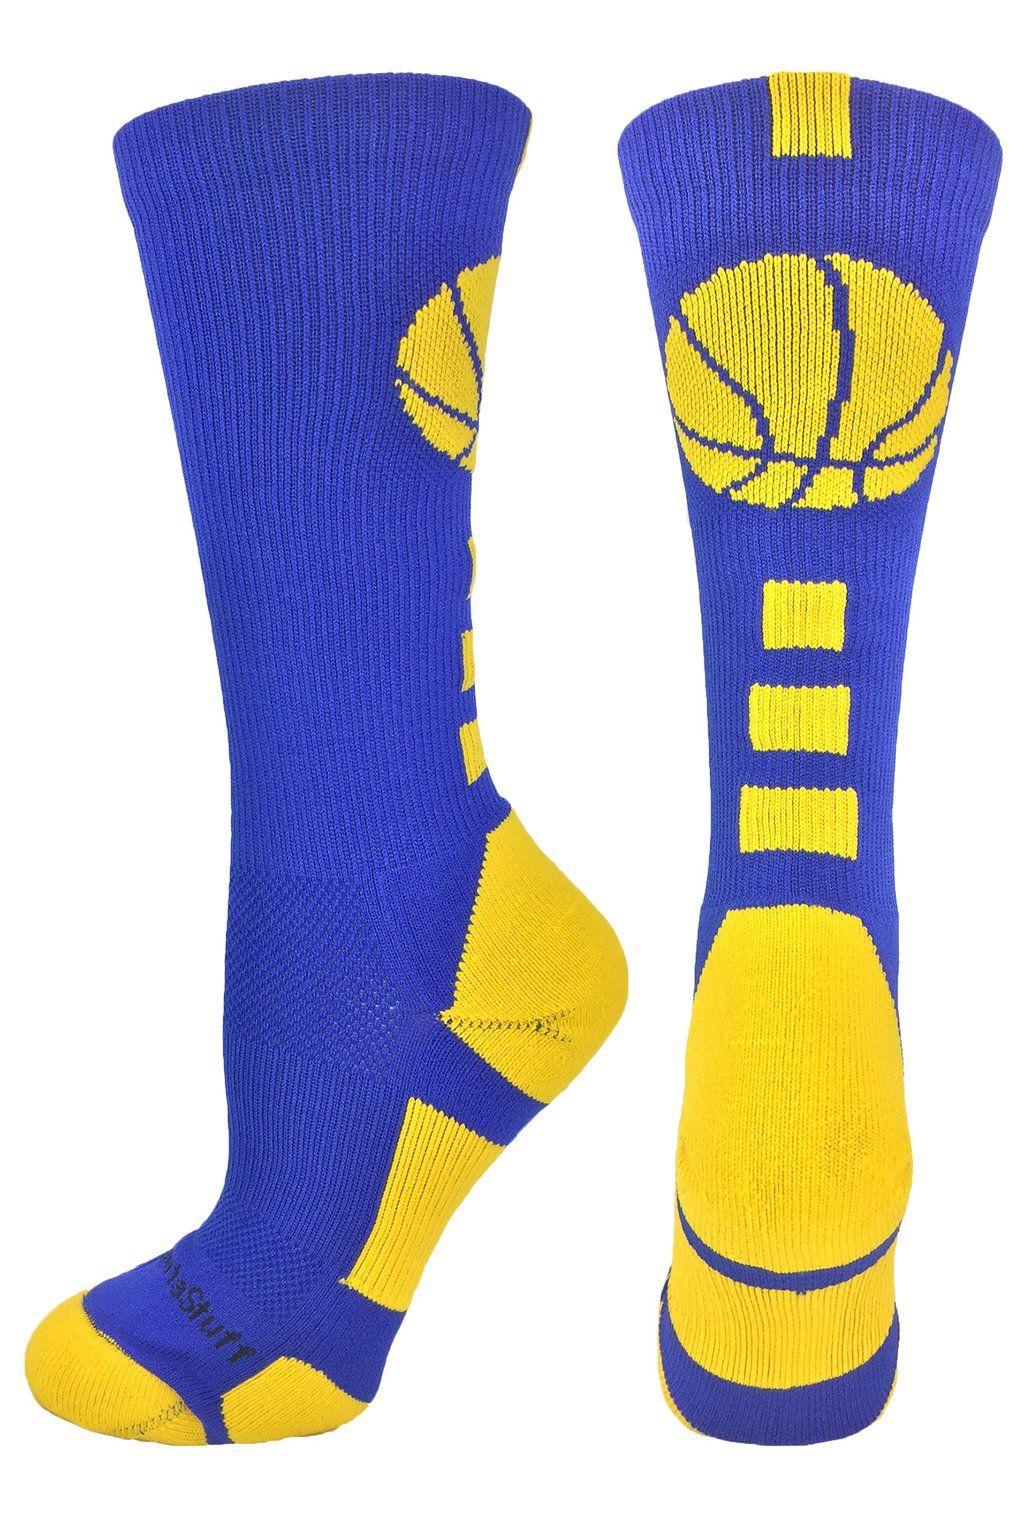 on sale 6b34f 6d87d Logo Basketball Socks   Youth Boys Basketball Socks   MadSportsStuff